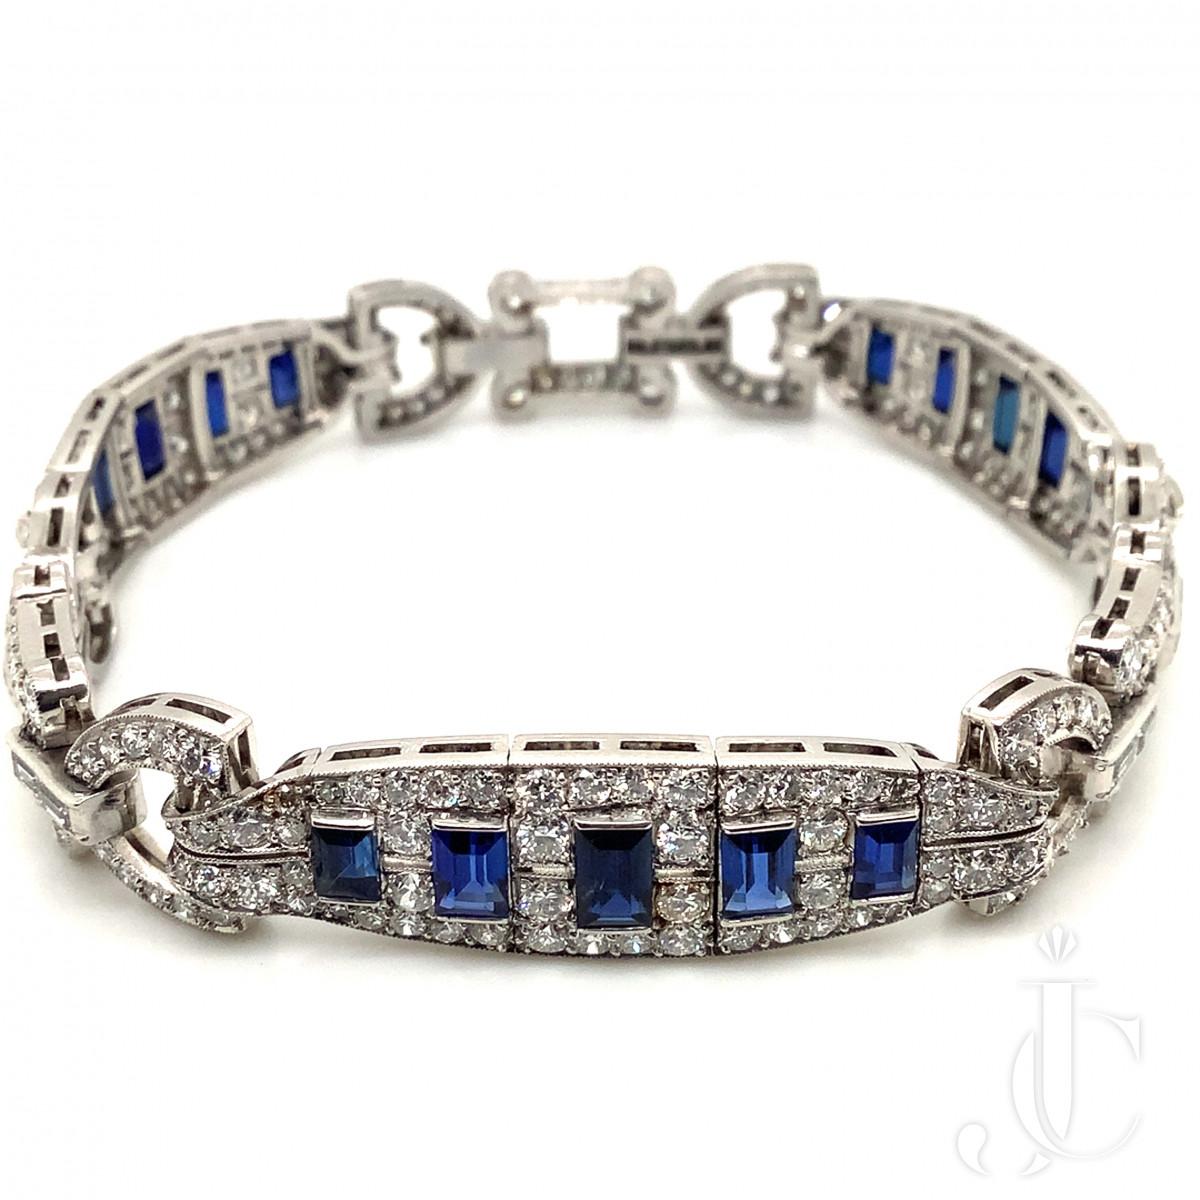 Art Deco Sapphire and Diamond Bracelet